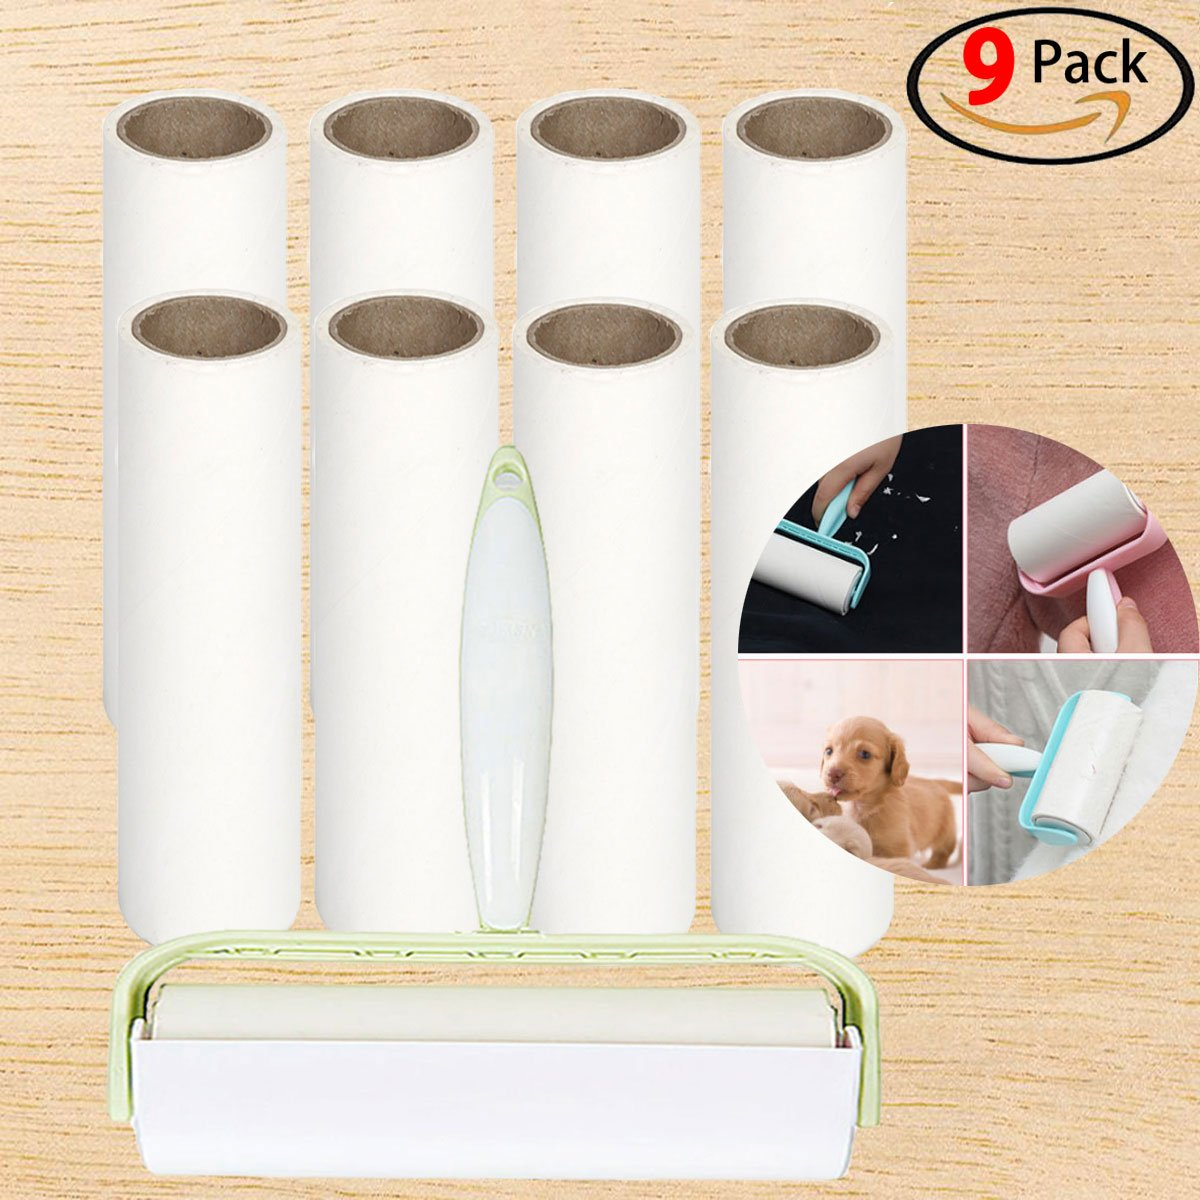 Lint Roller Pet Hair Roller Stick Roller Pet Fur Remover 9 Rolls of Stick Paper for Clothes/Pet/ Furniture/Car Total 540 Sheets